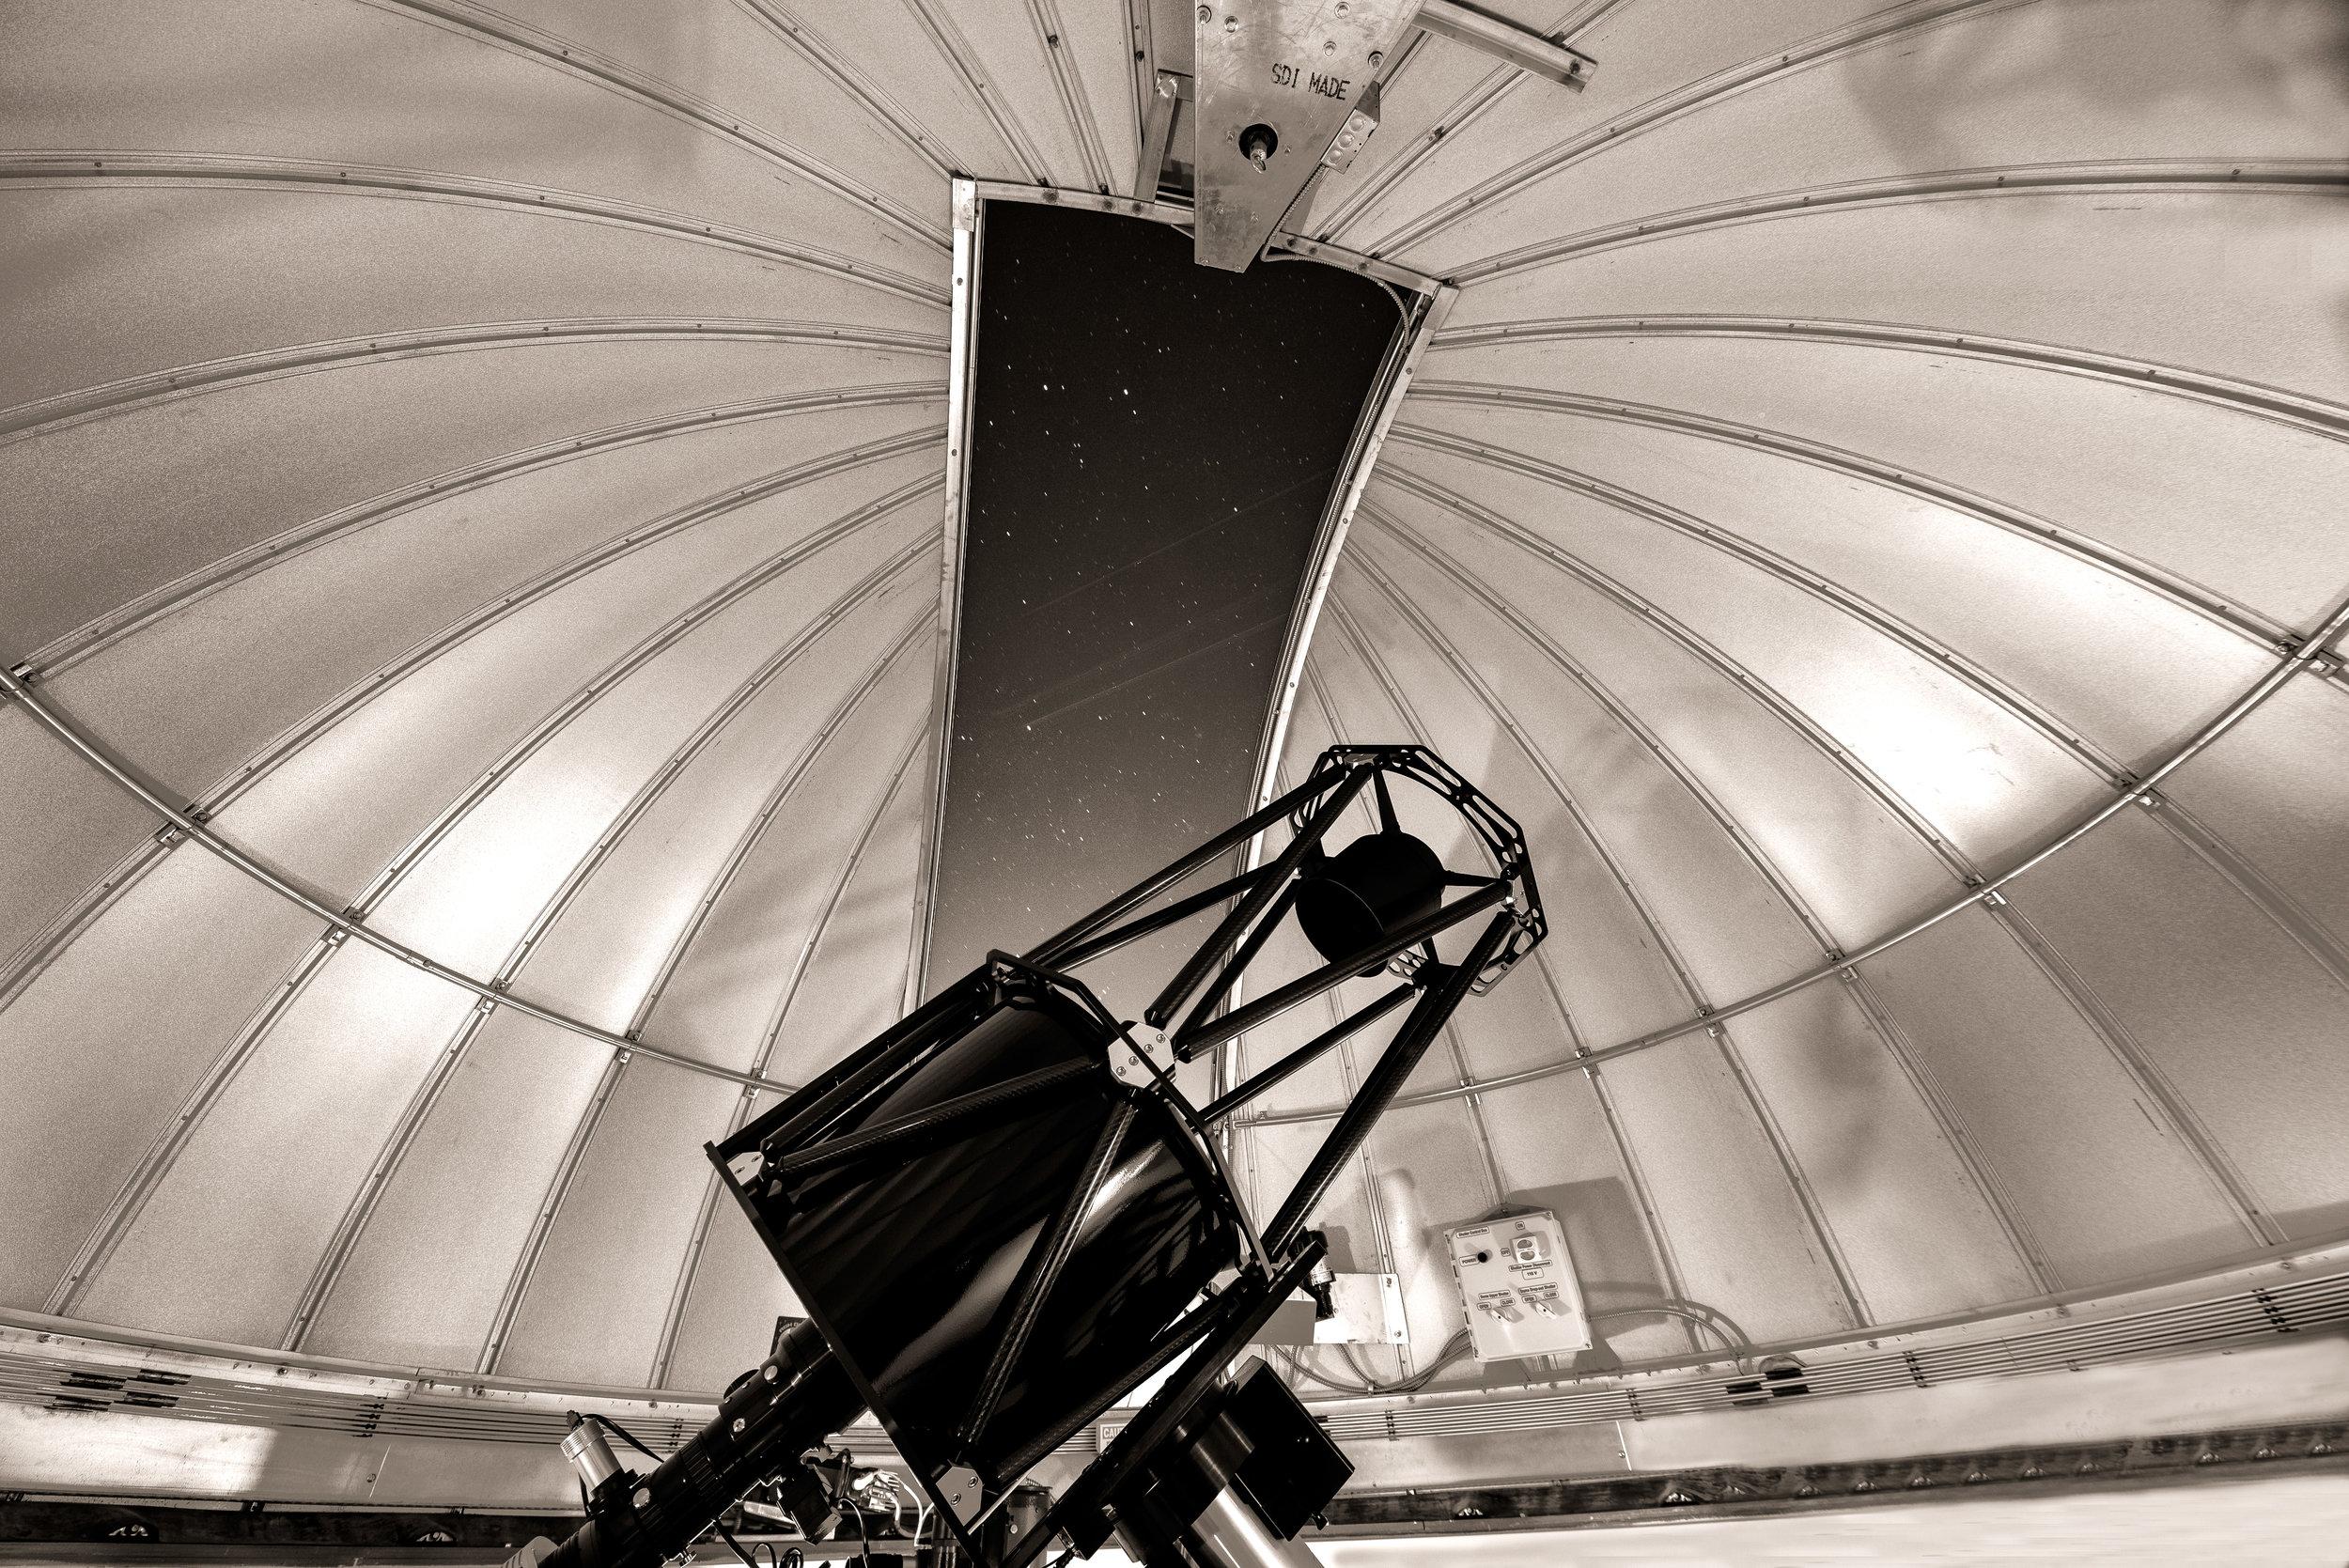 Halo_Observatory_v6_1932-2_1.jpg